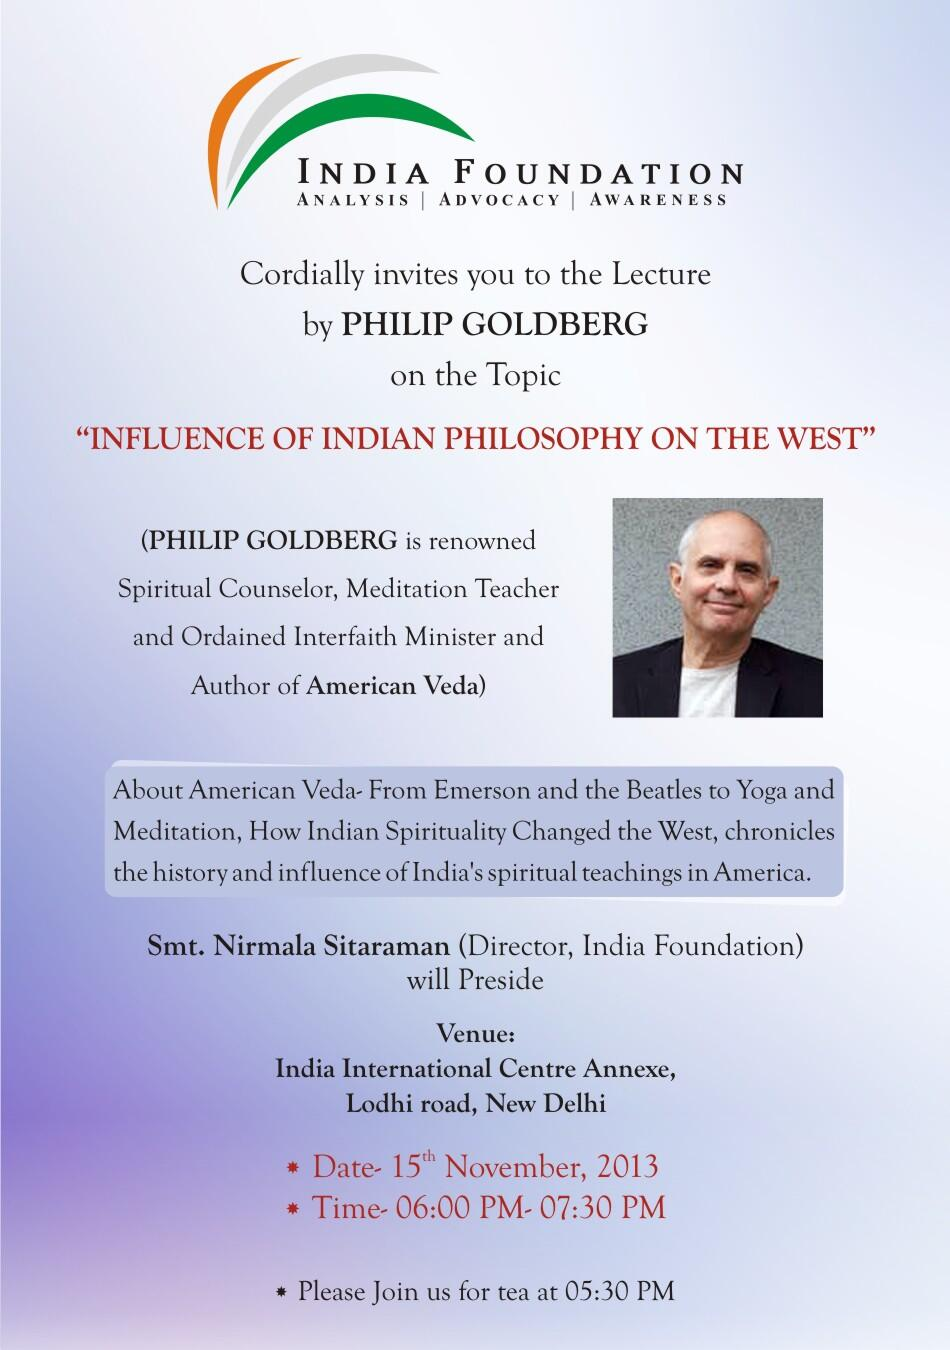 rajiv malhotra breaking india pdf